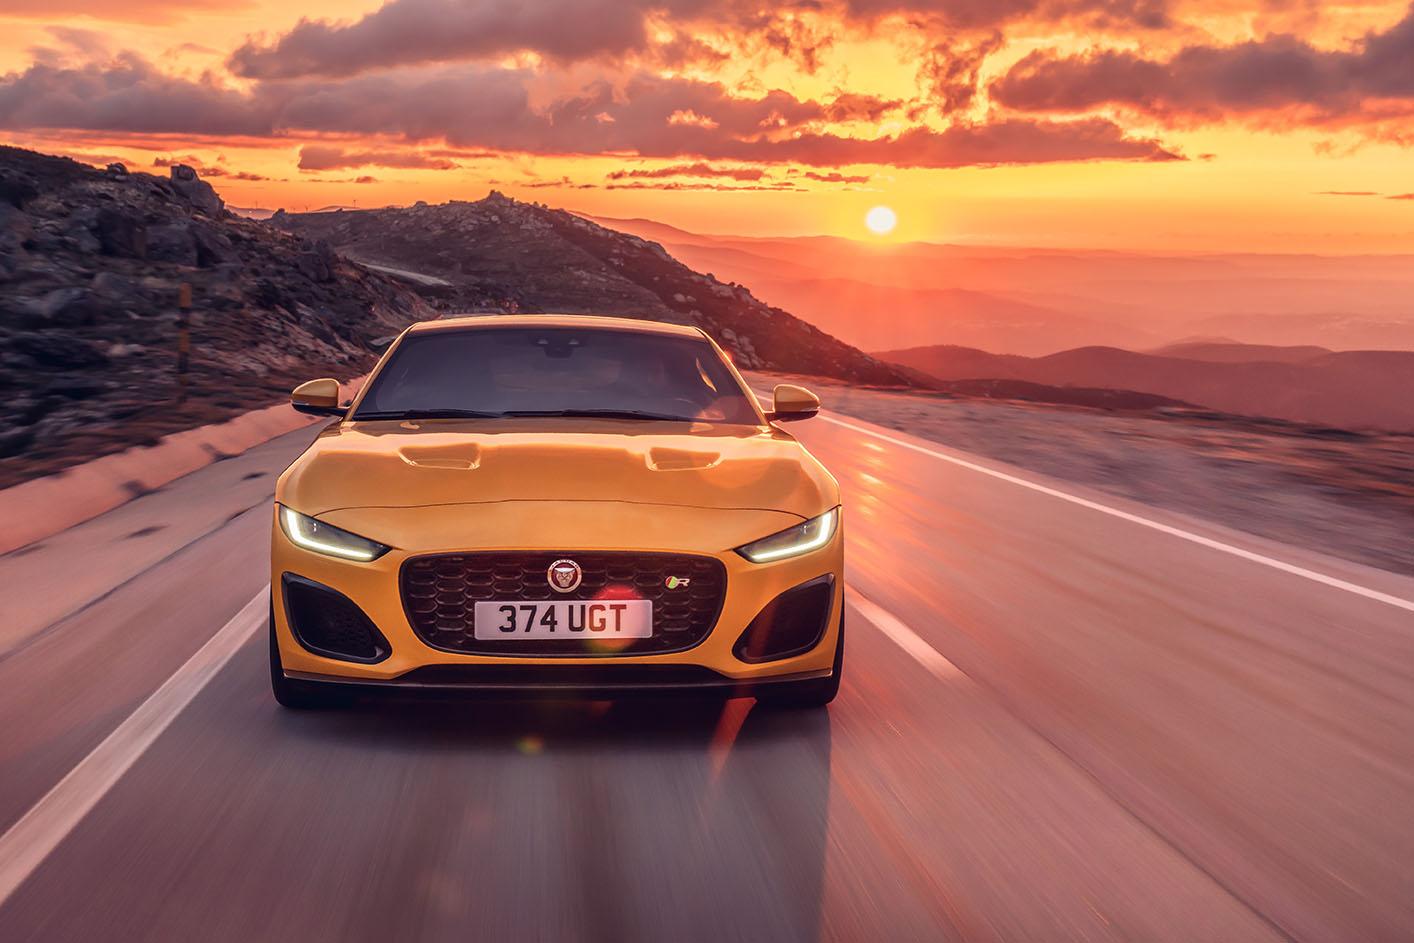 Jaguar F-Type R Coupé – Bei der Jaguar Land Rover SVO Tour vom 28.9. bis 9.10.2021 bei Auto Stahl Wien 22 erleben!